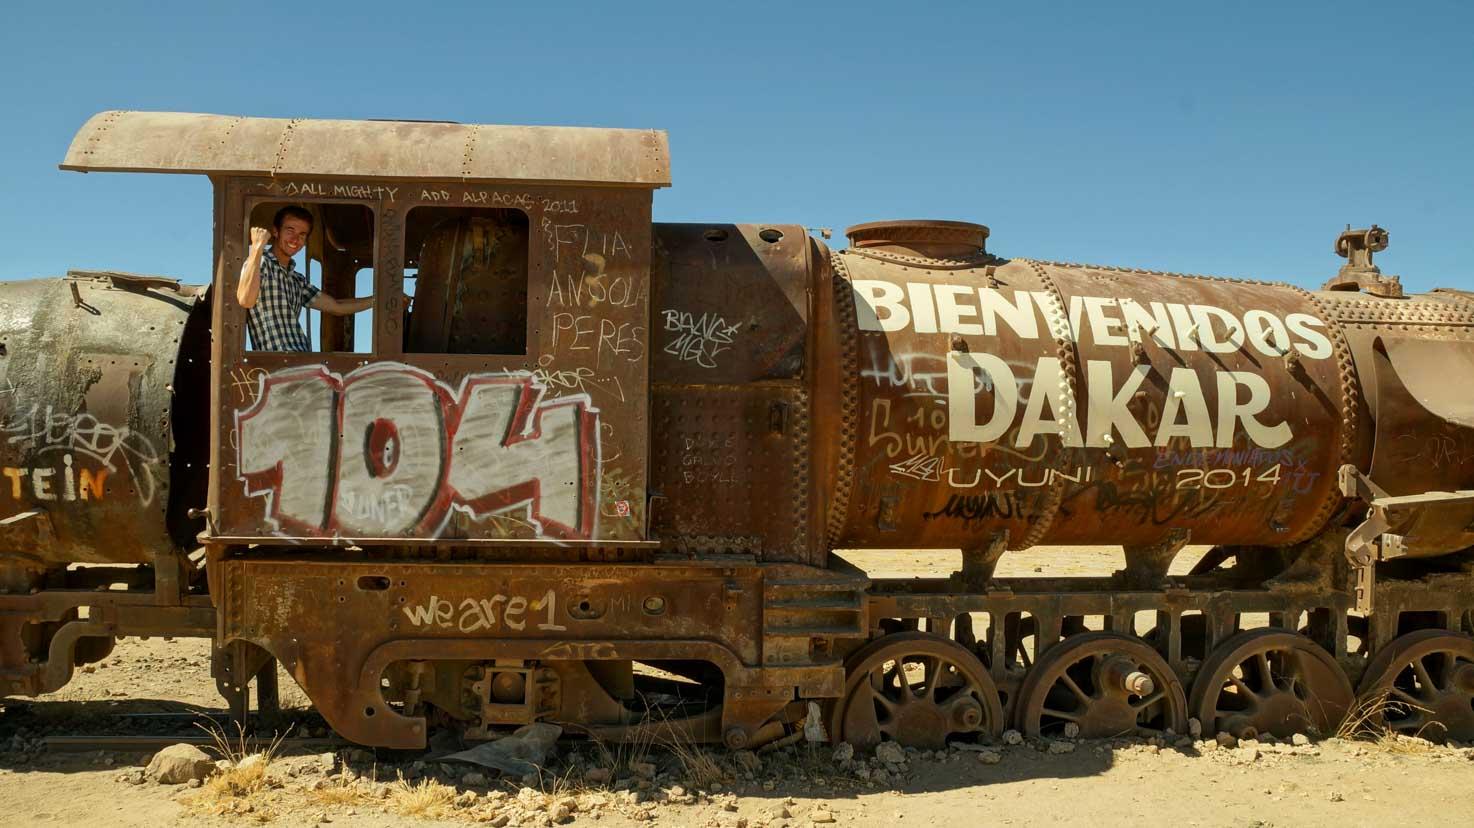 2013.08.13 Bolivia, Madidi National Park (10)